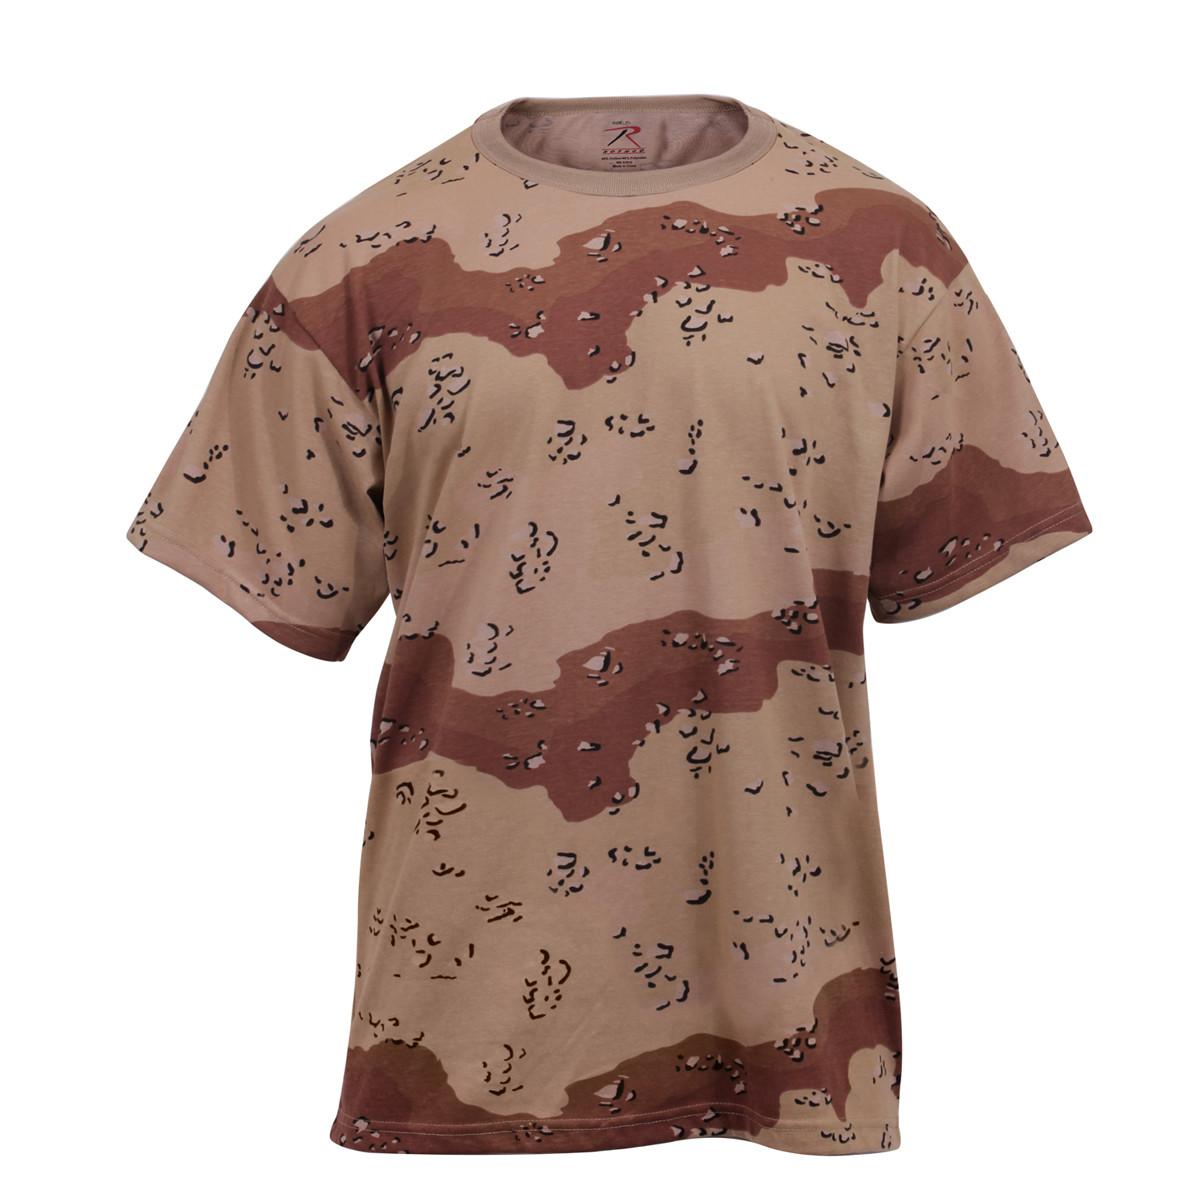 4d8ac37ed Shop Six Color Desert Camo T Shirt - Fatigues Army Navy Gear